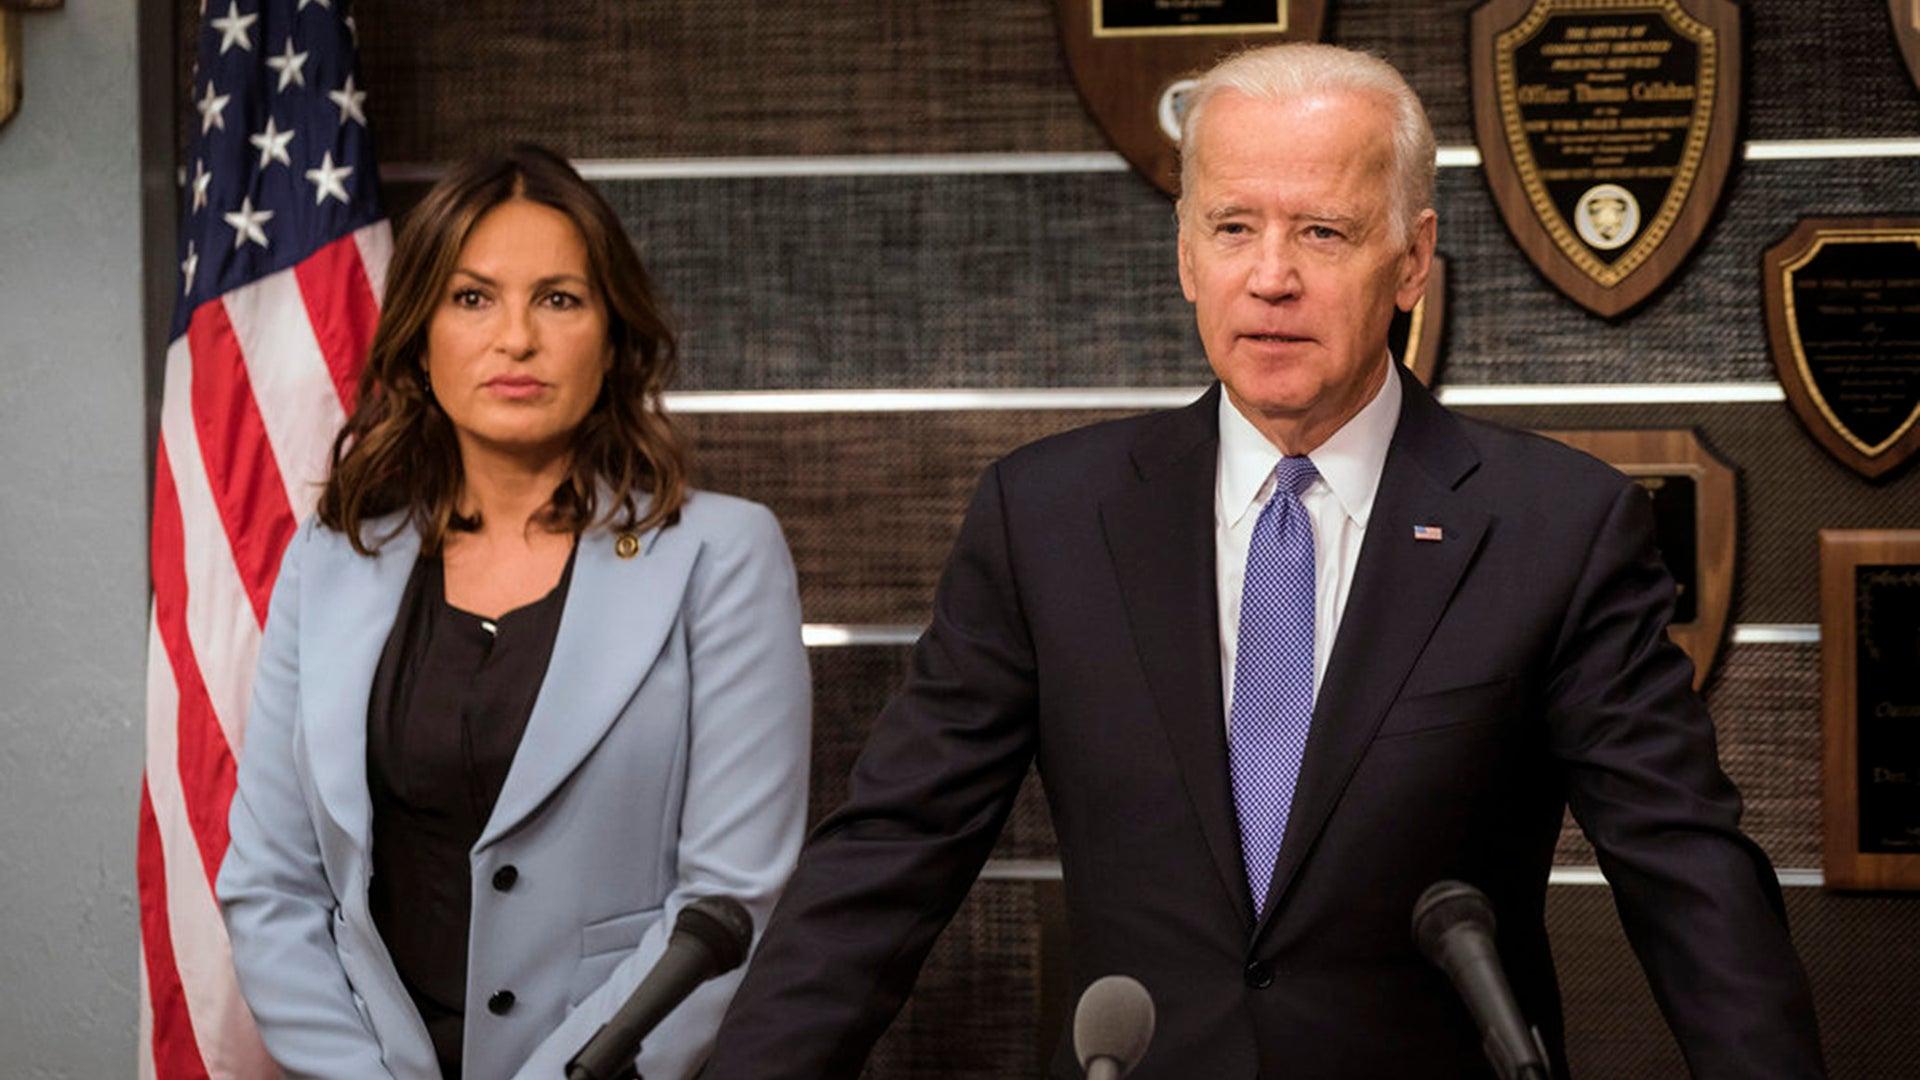 Mariska Hargitay and Vice President Joe Biden, Law & Order: SVU